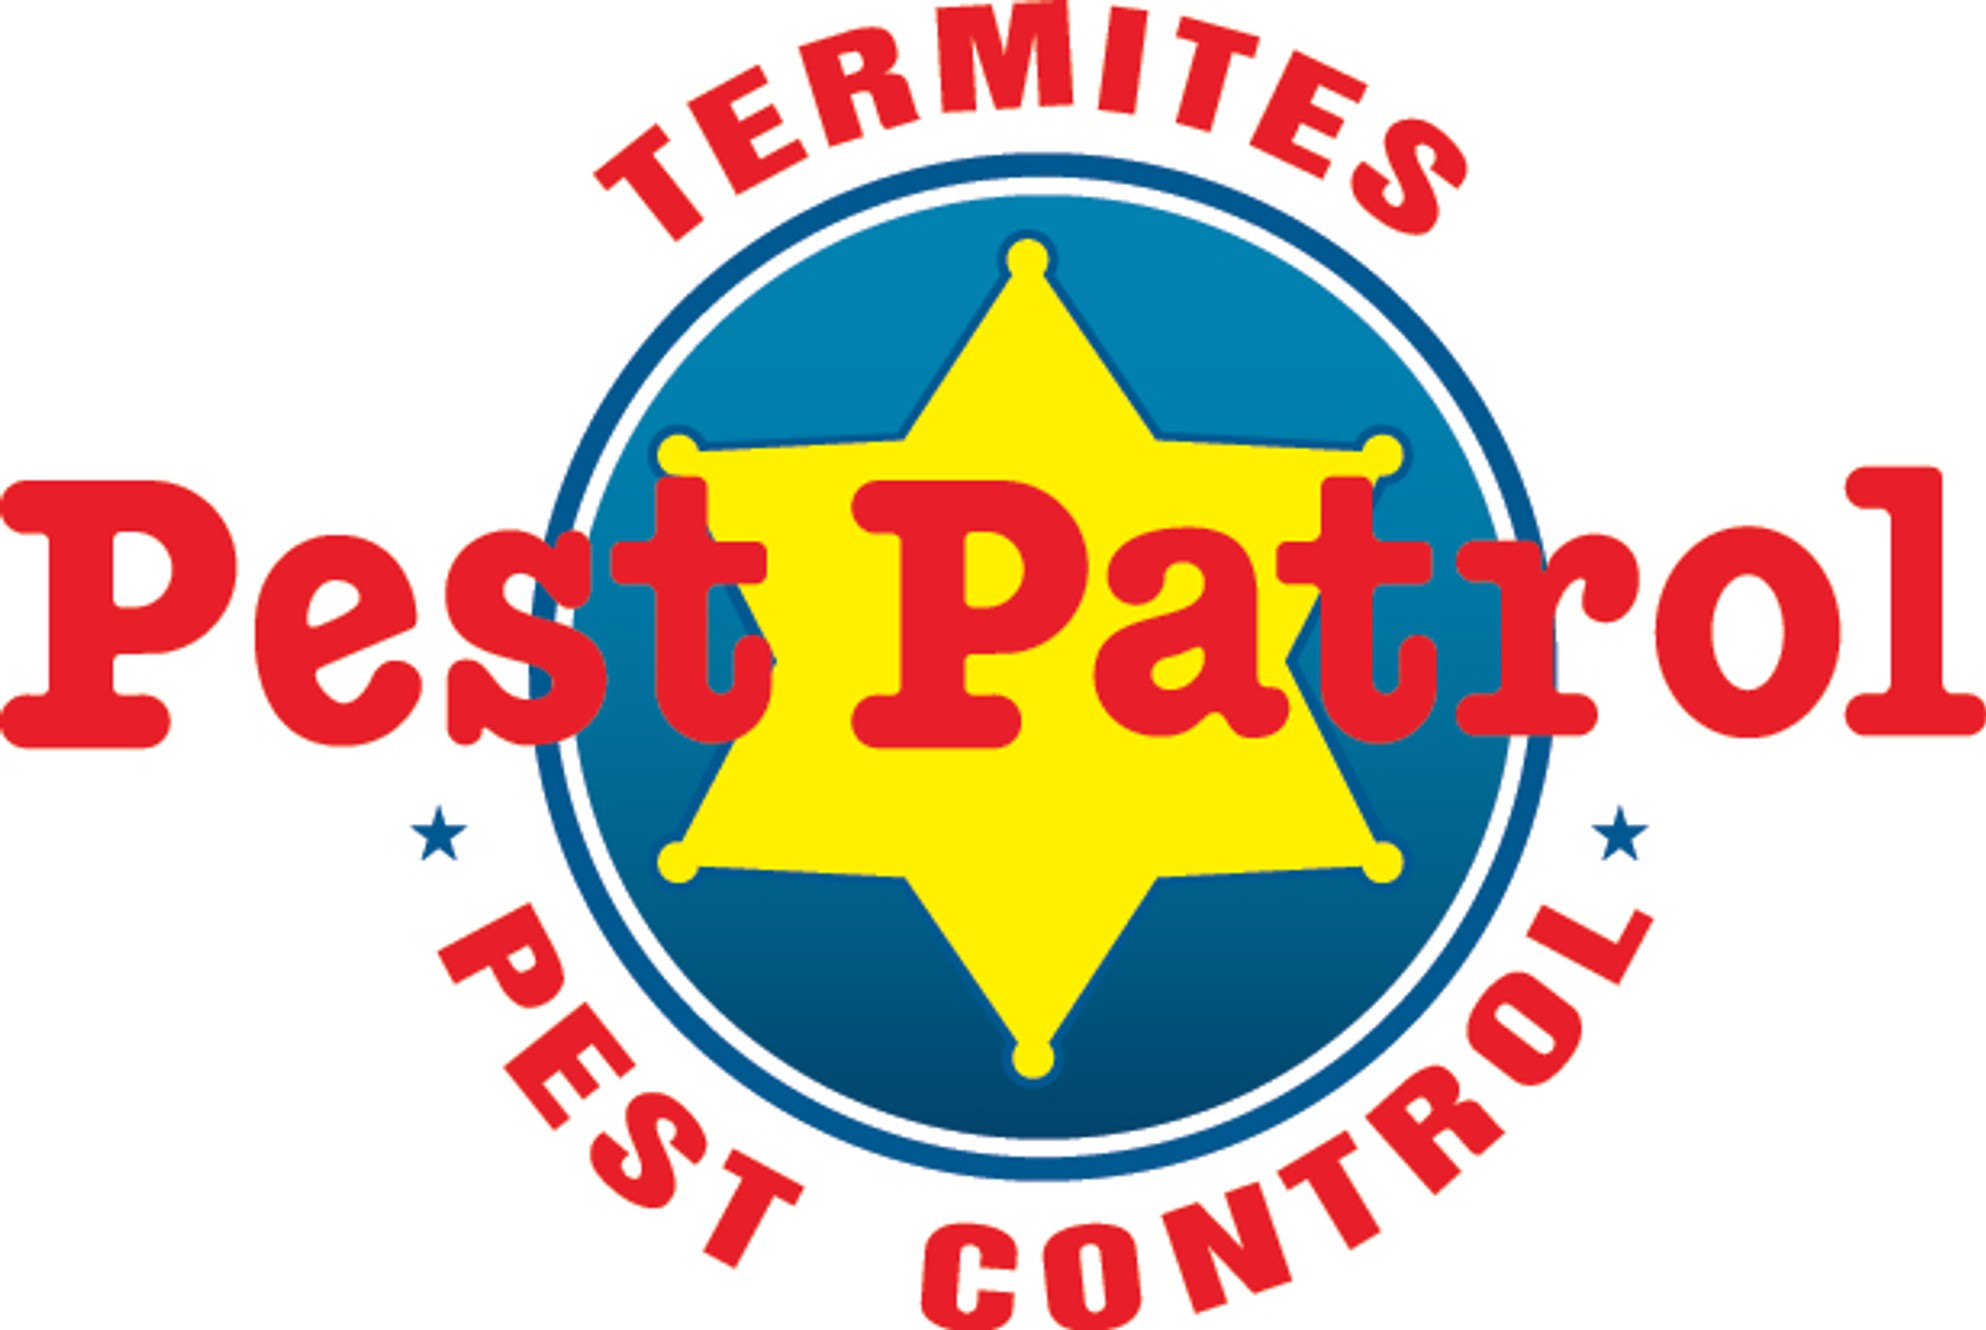 Pest Patrol logo